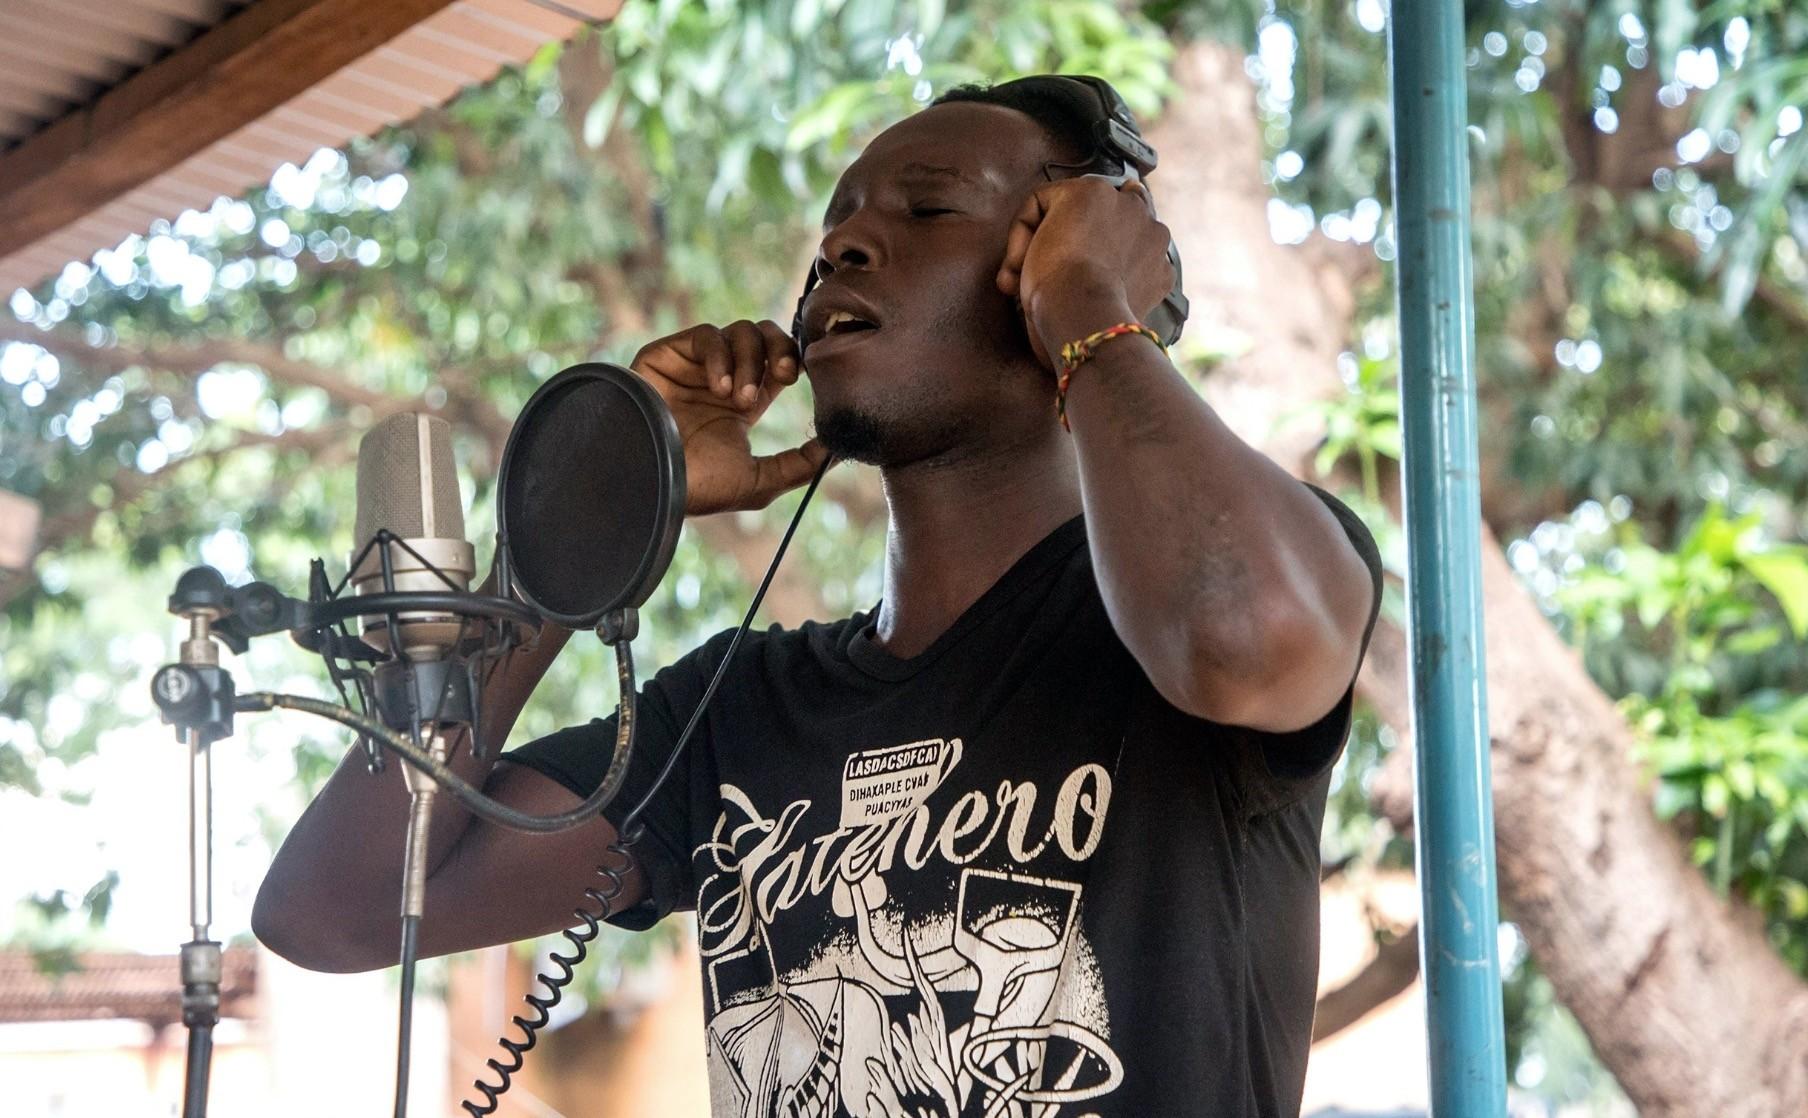 Jonathan Sougue, records his album at the Bobo Dioulasso prison.